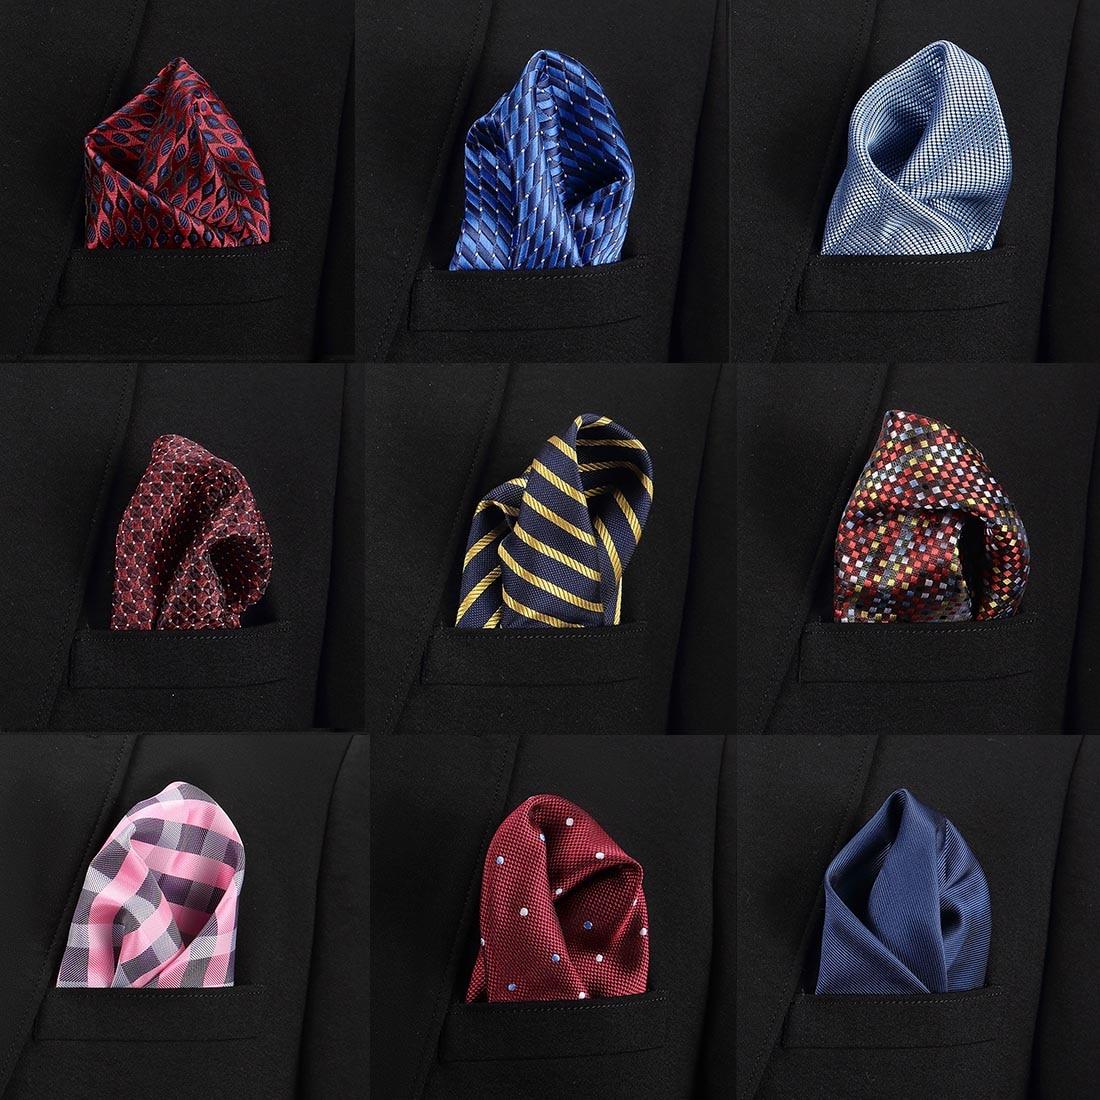 Classic  New Mens Pocket Squares Solid Pattern  Handkerchief Fashion Hanky For Men Business Suit Accessories Wedding 22cm*22cm